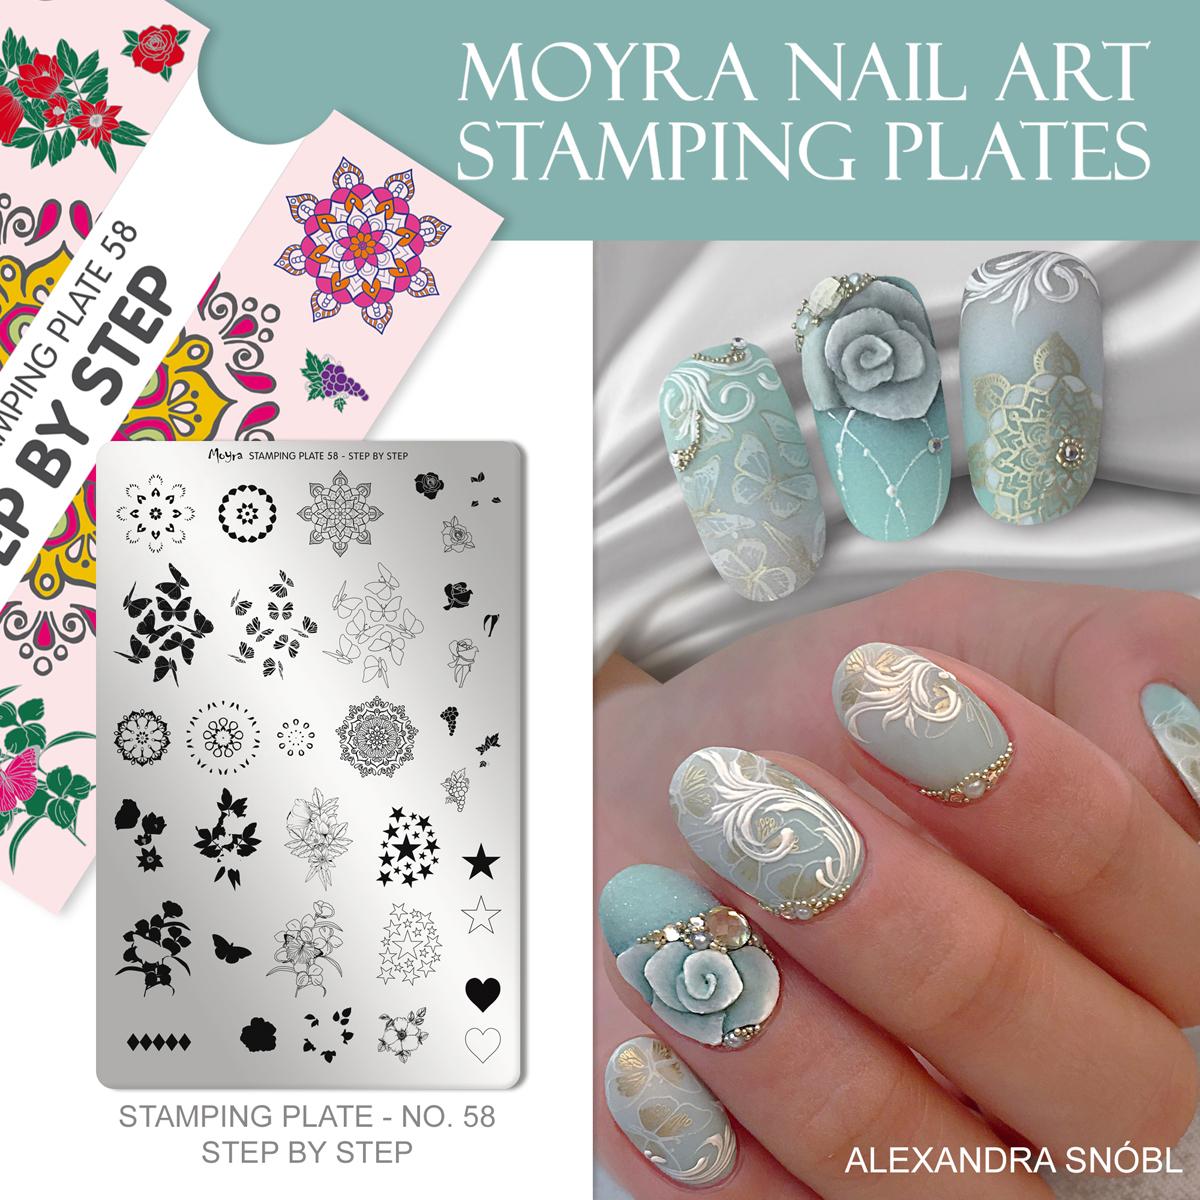 Moyra Nail Art Stamping Plate No. 58 Step by step